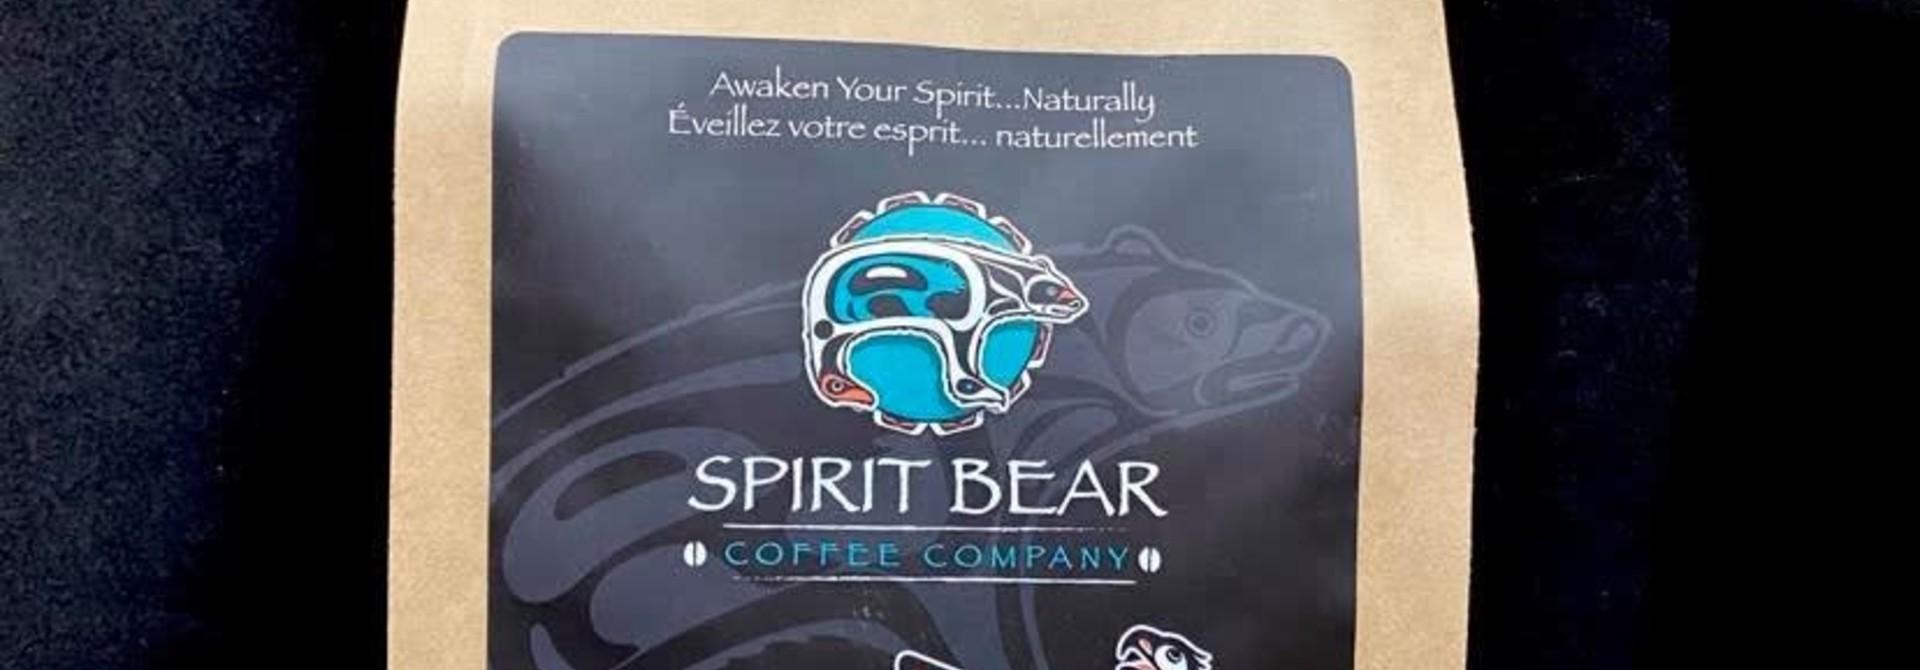 Spirit Bear Coffee-Eagle Medium Roast Beans 400g